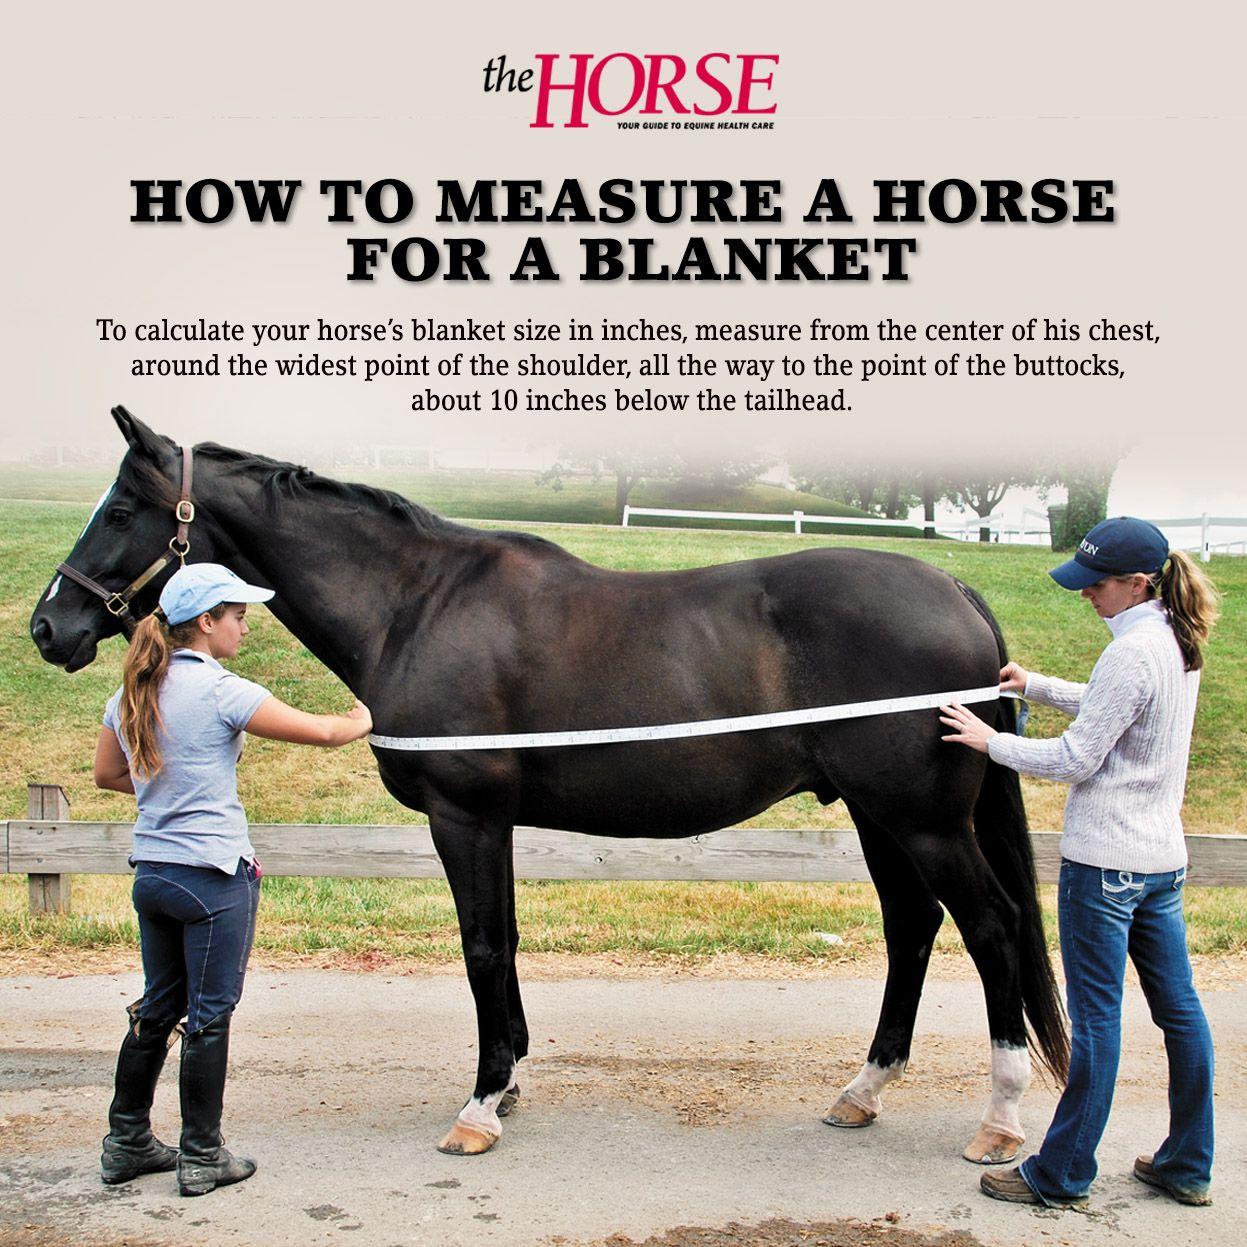 Horse blanketing faqs horses horse care horse training